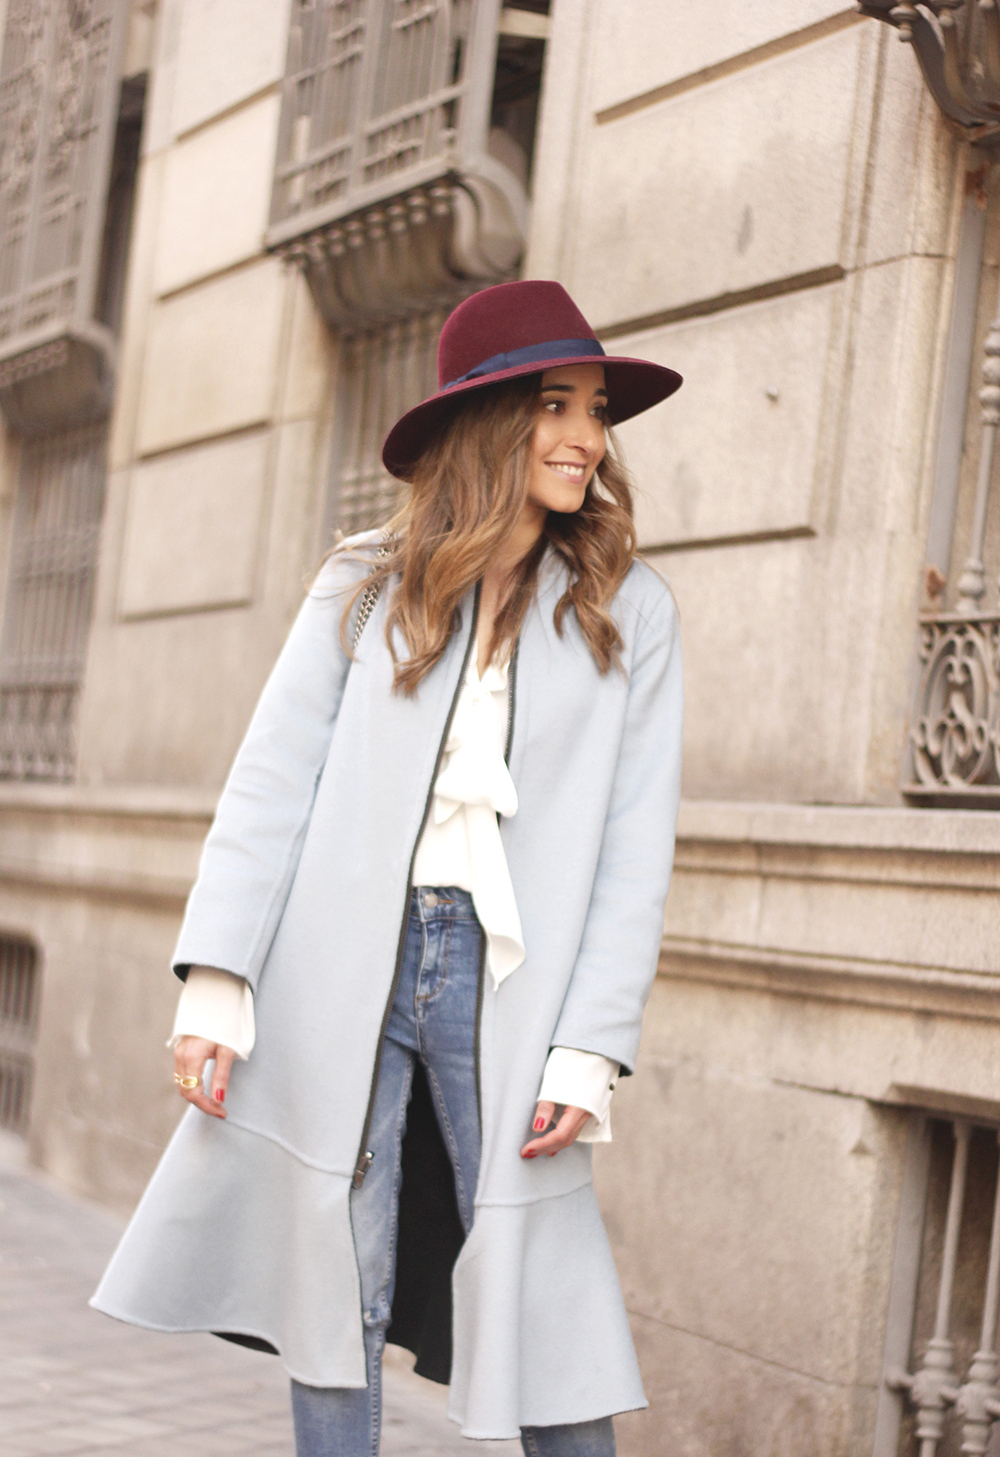 blue coat uterqüe abrigo azul gucci bag burgundy heels winter outfit street style fashion08